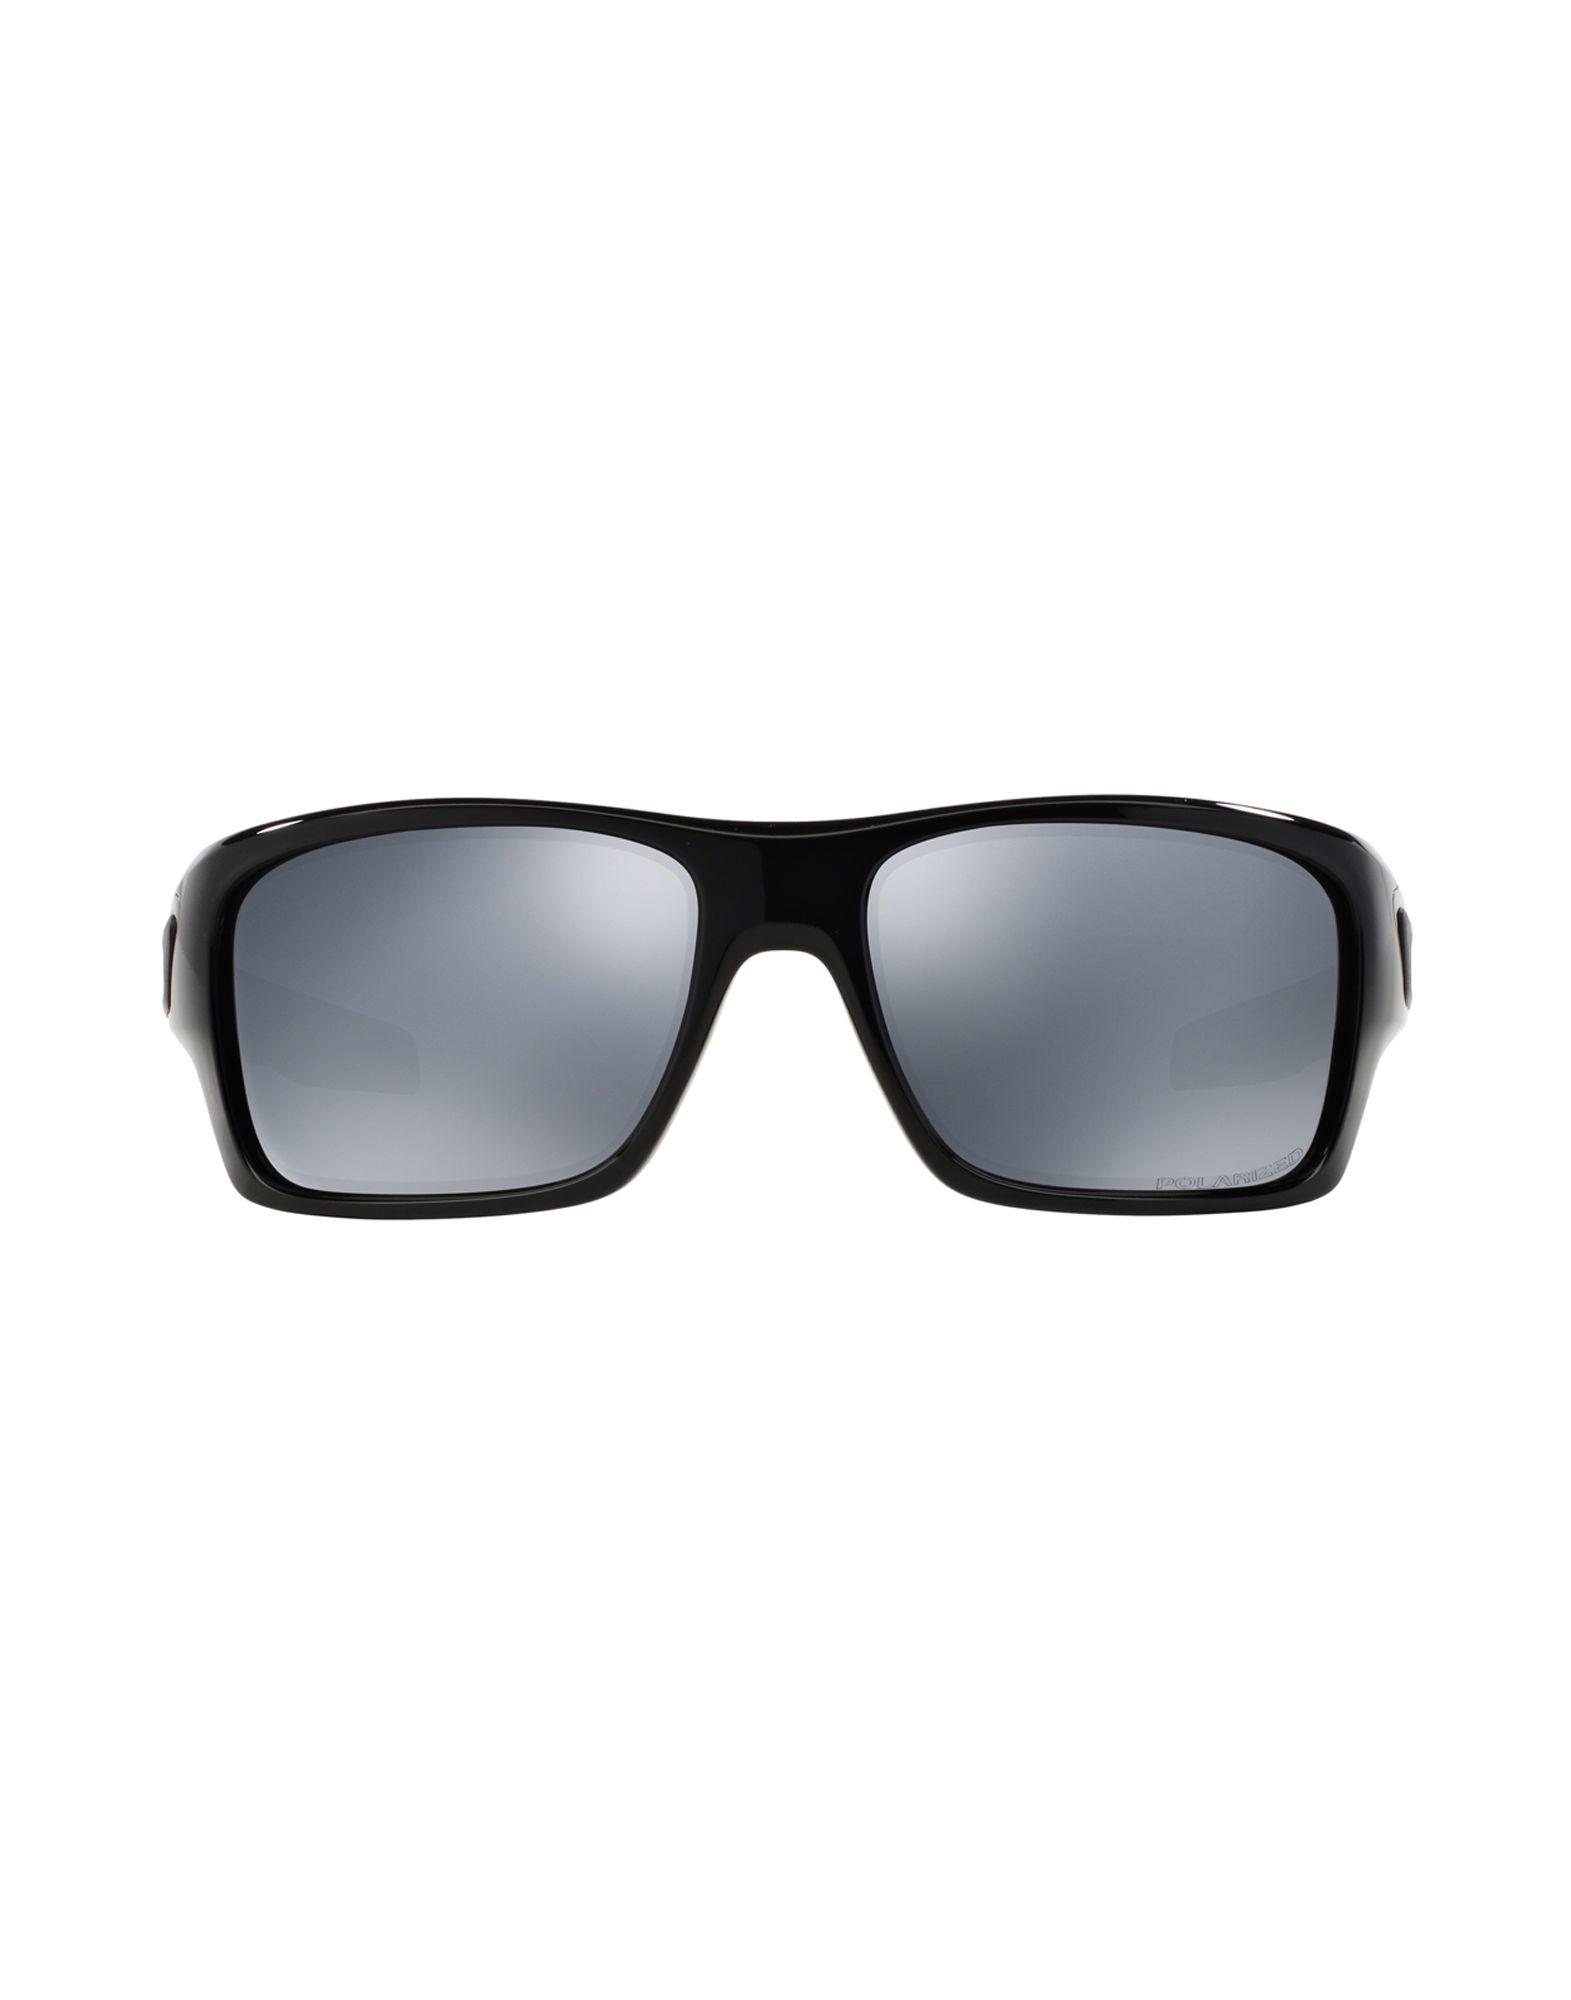 Glasses Frame Repair Liverpool : oakley sunglasses symbol